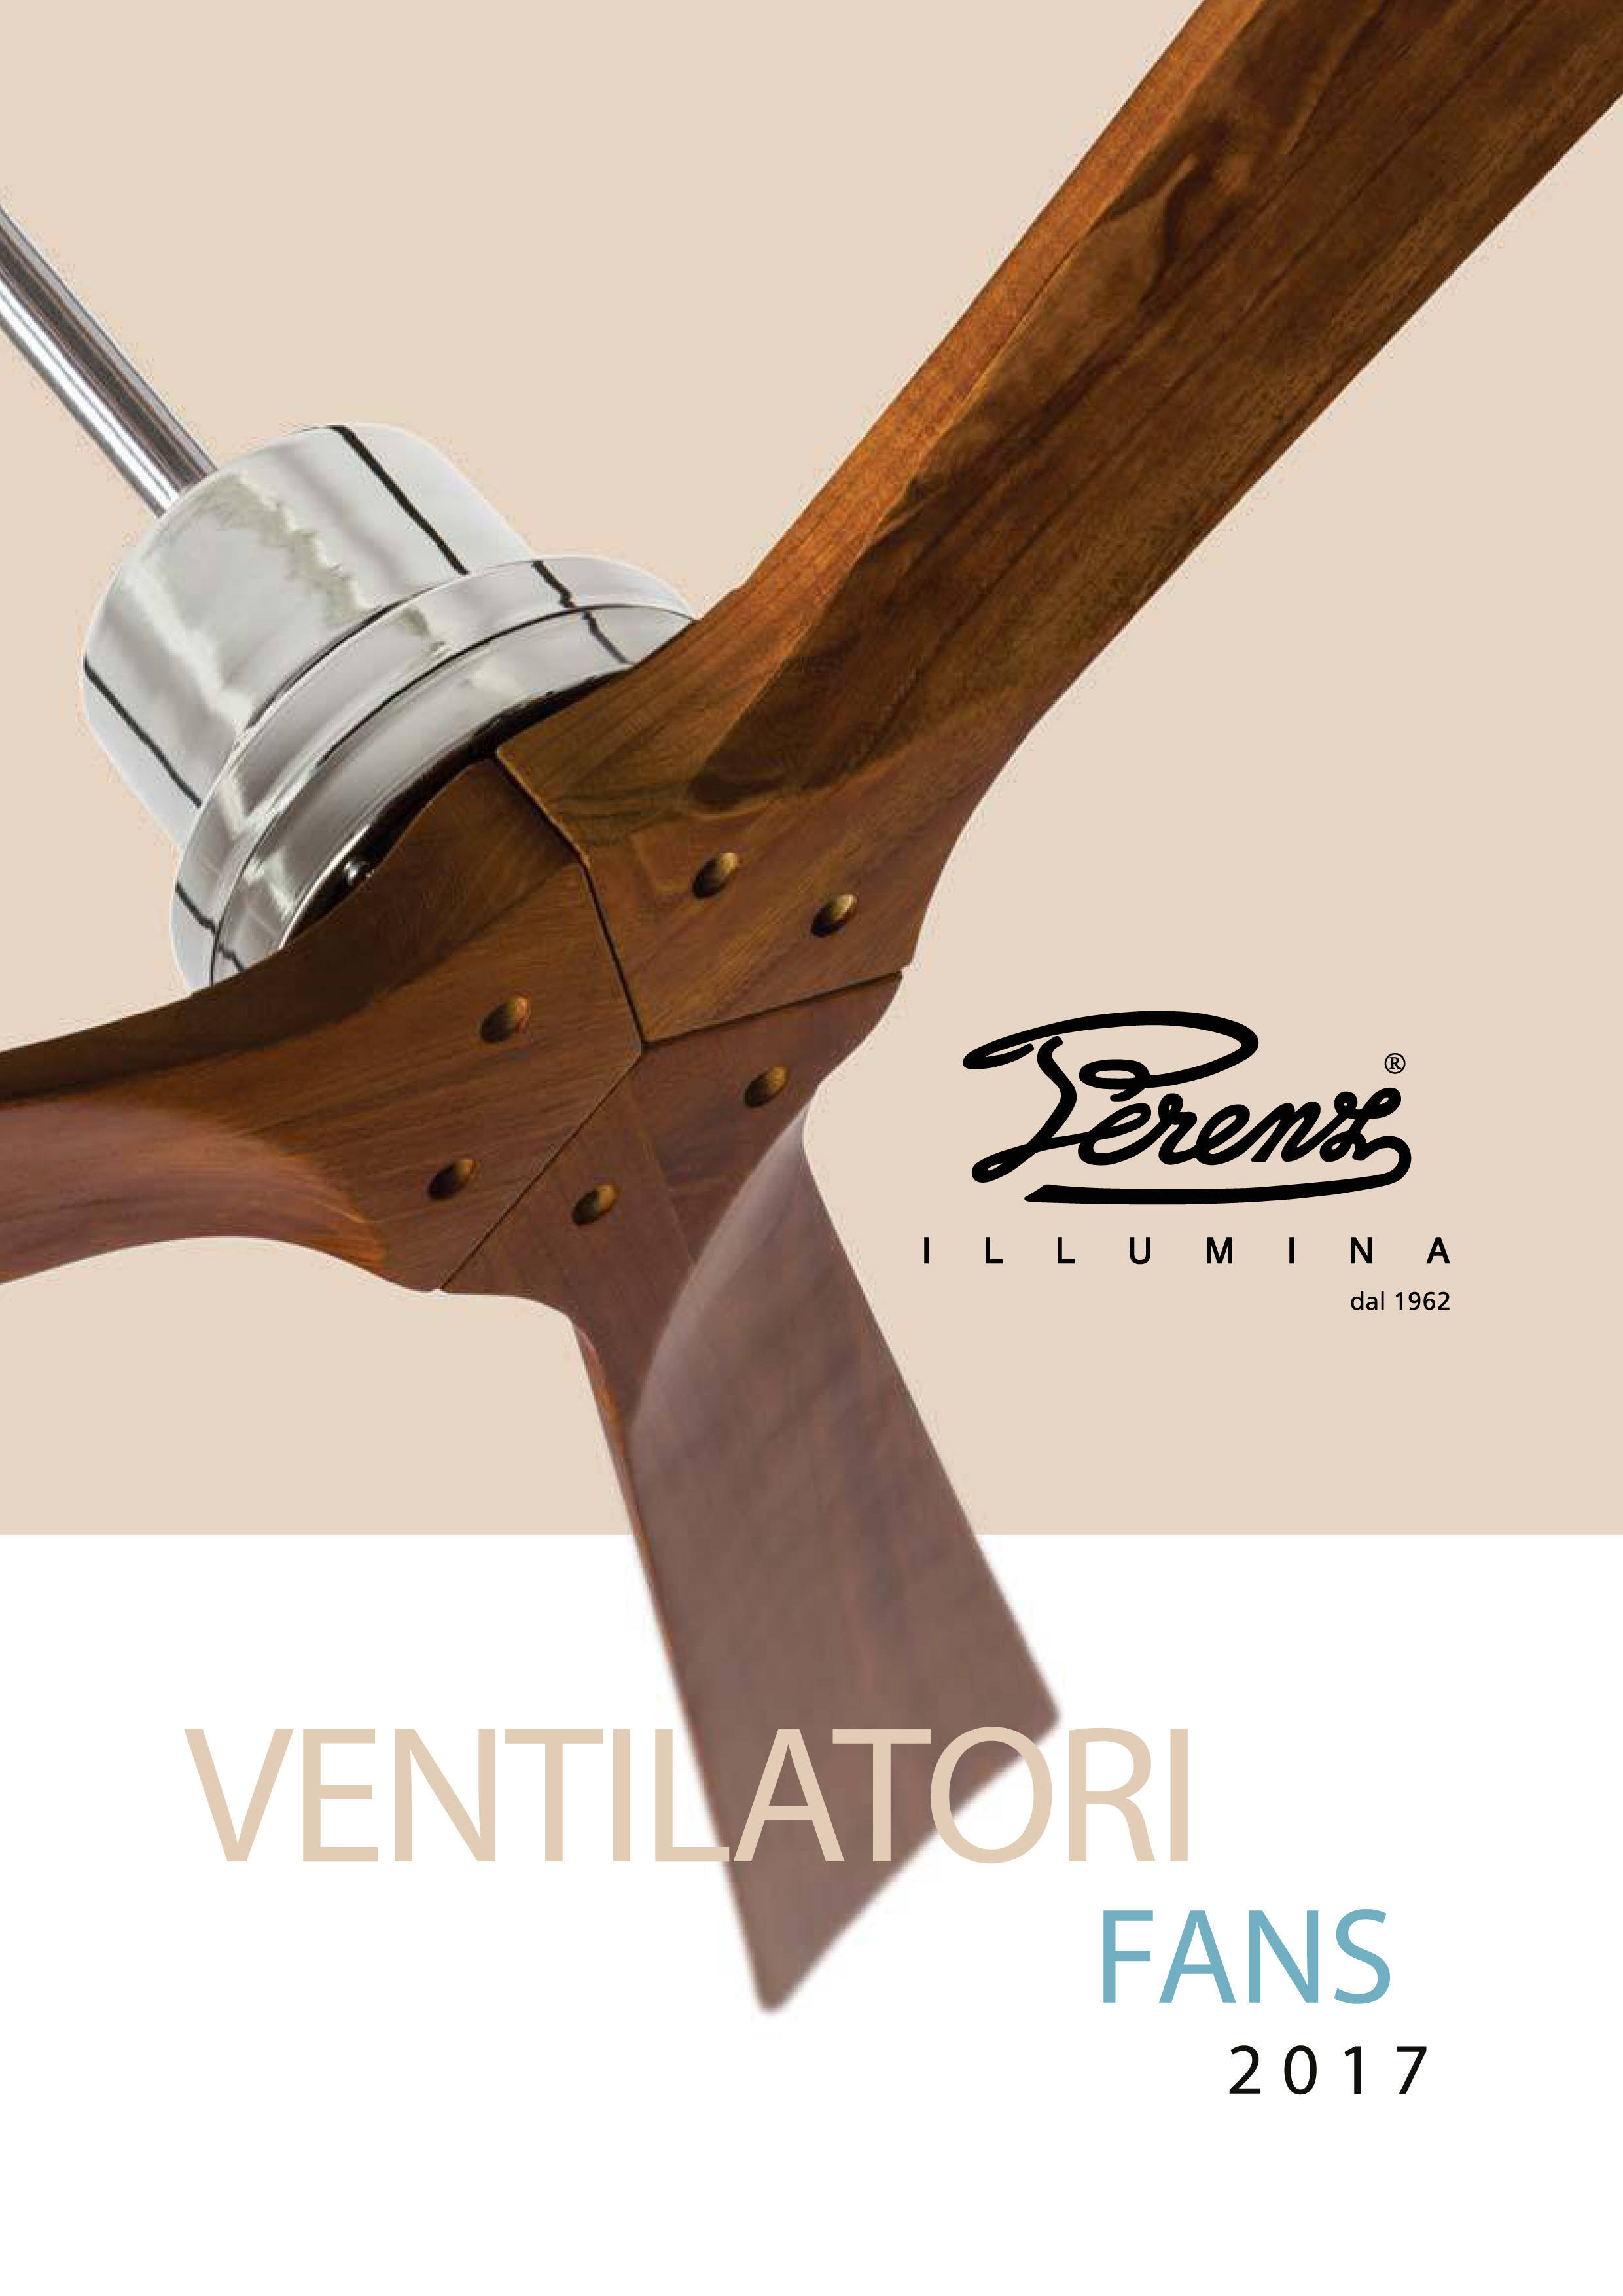 catalogo ventilatori perenz